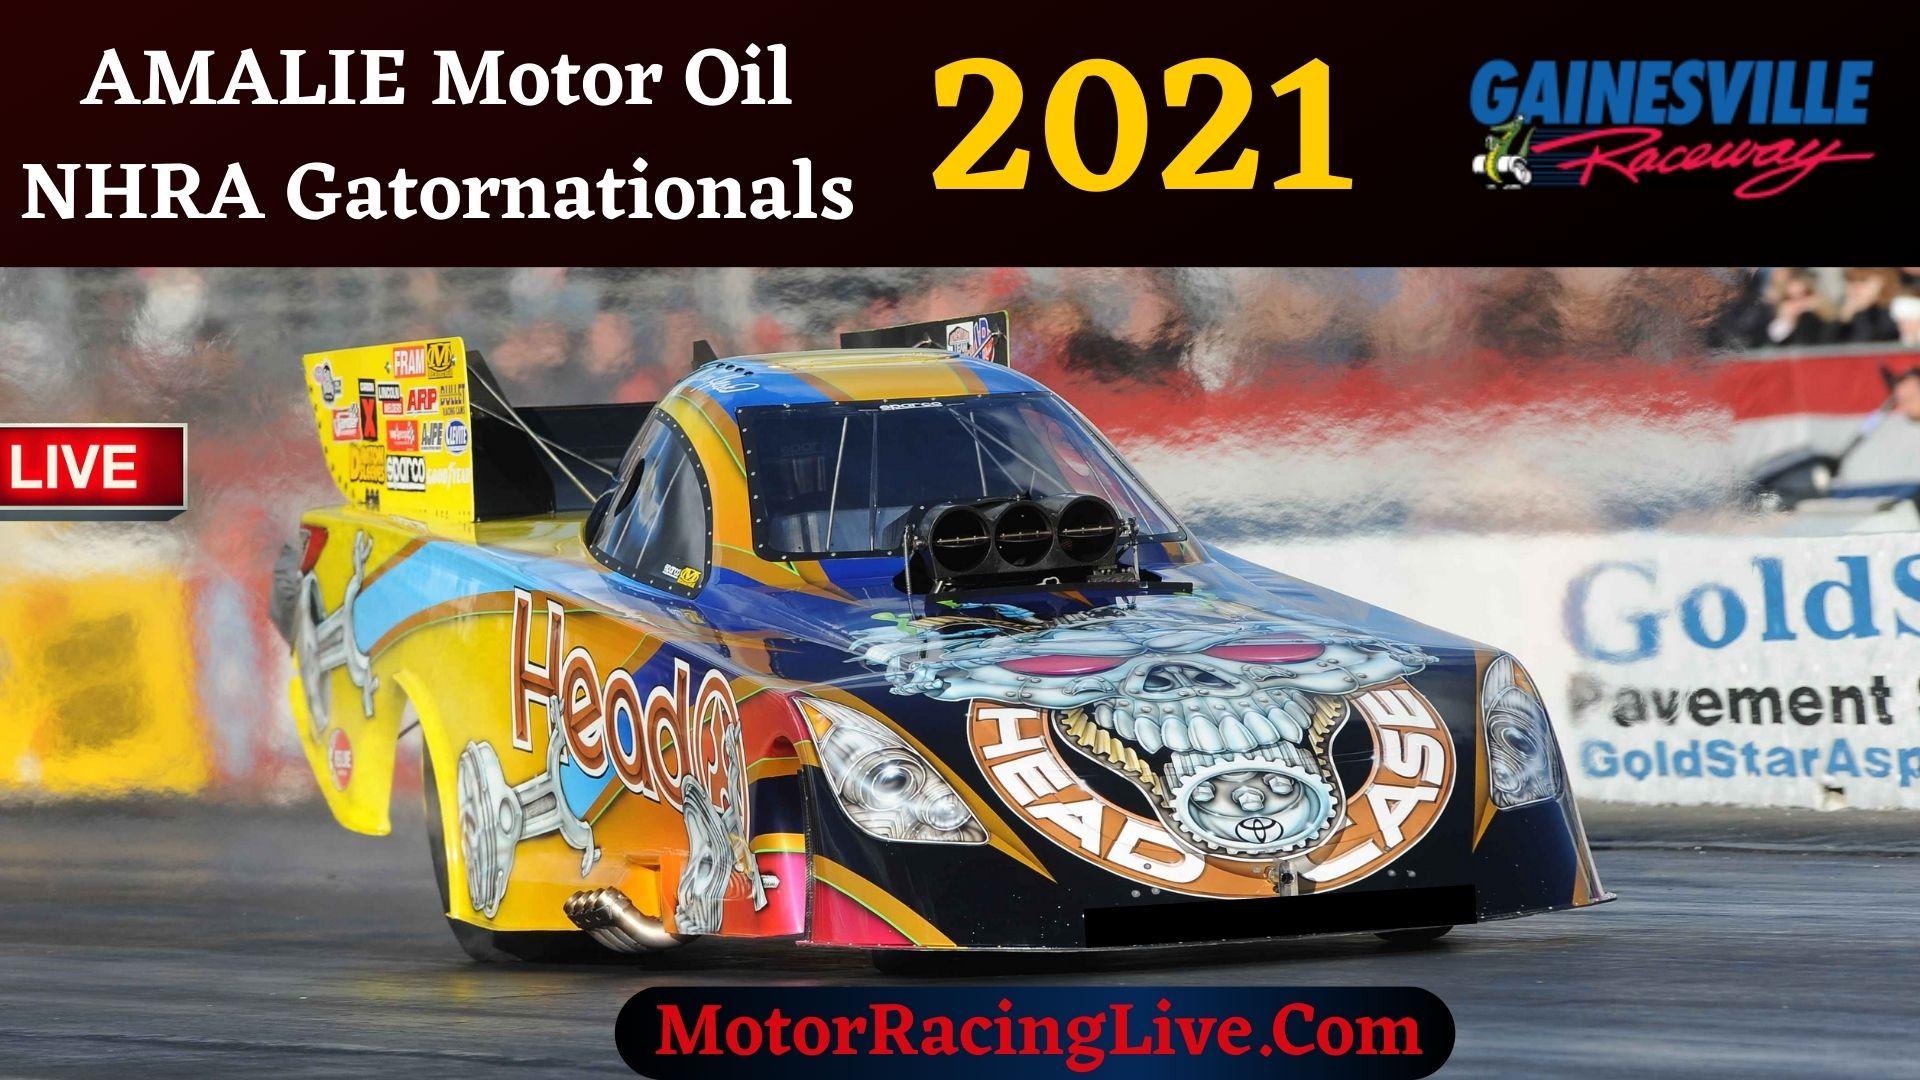 AMALIE Motor Oil NHRA Gatornationals 2021 Live Stream